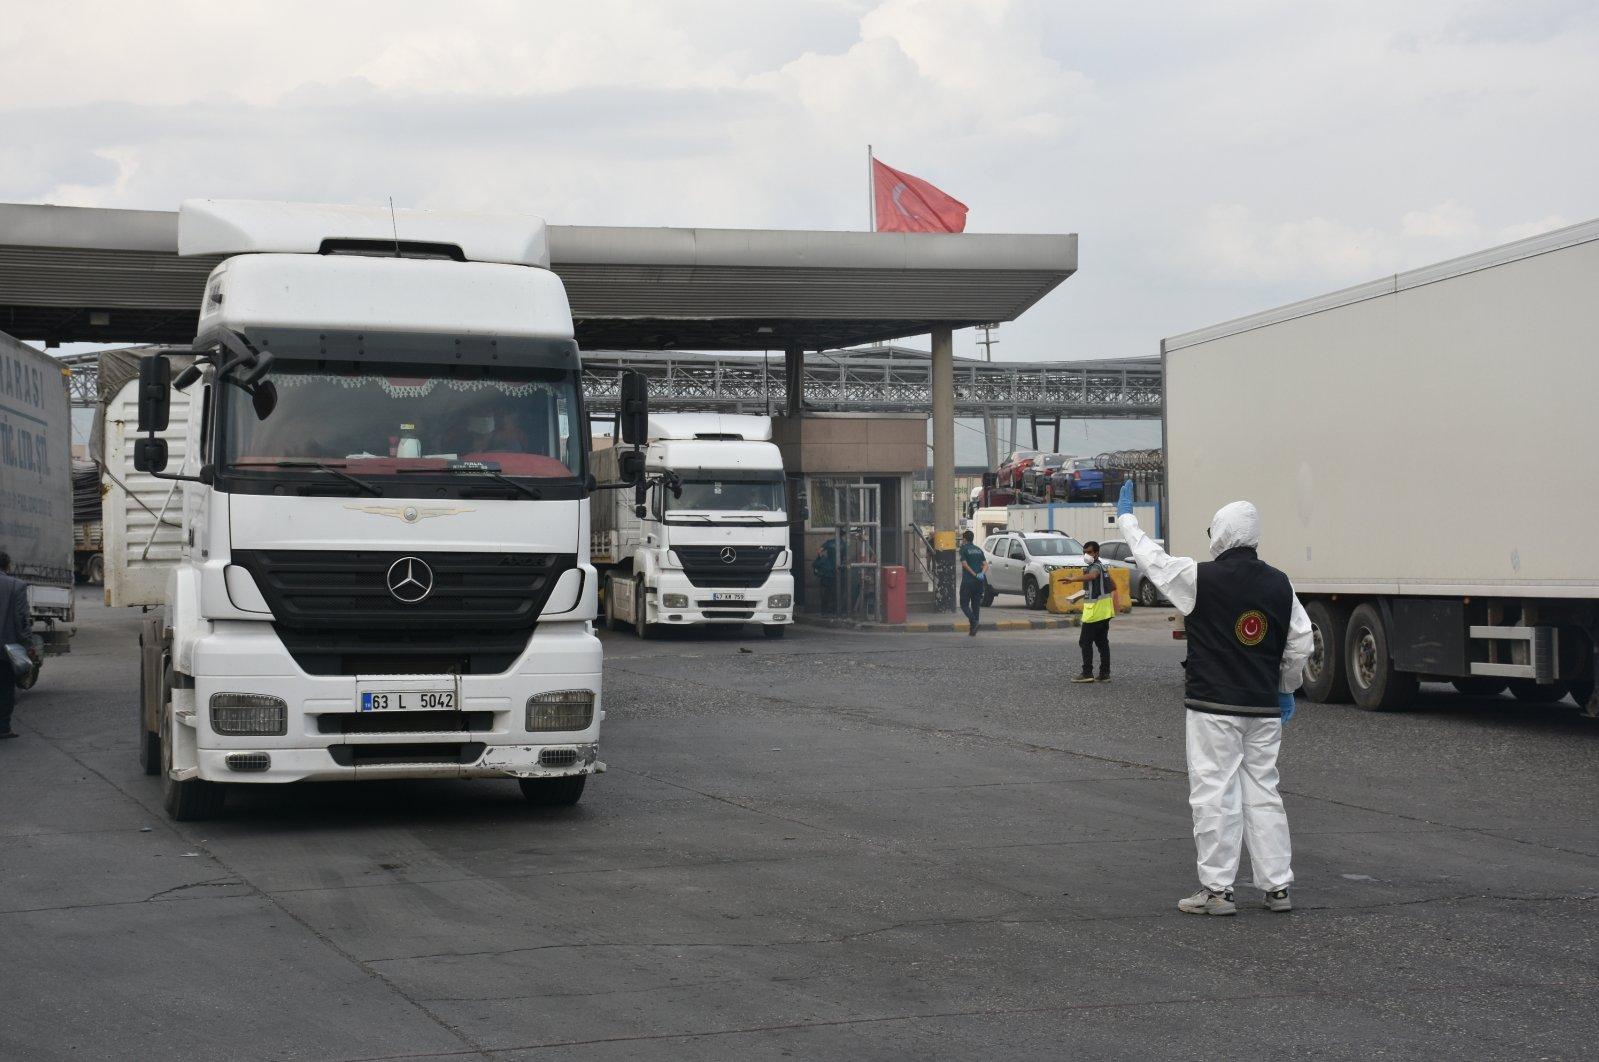 Trucks are seen at the Habur border gate in Turkey's southeastern Şırnak province bordering Iraq, April 22, 2020. (AA Photo)